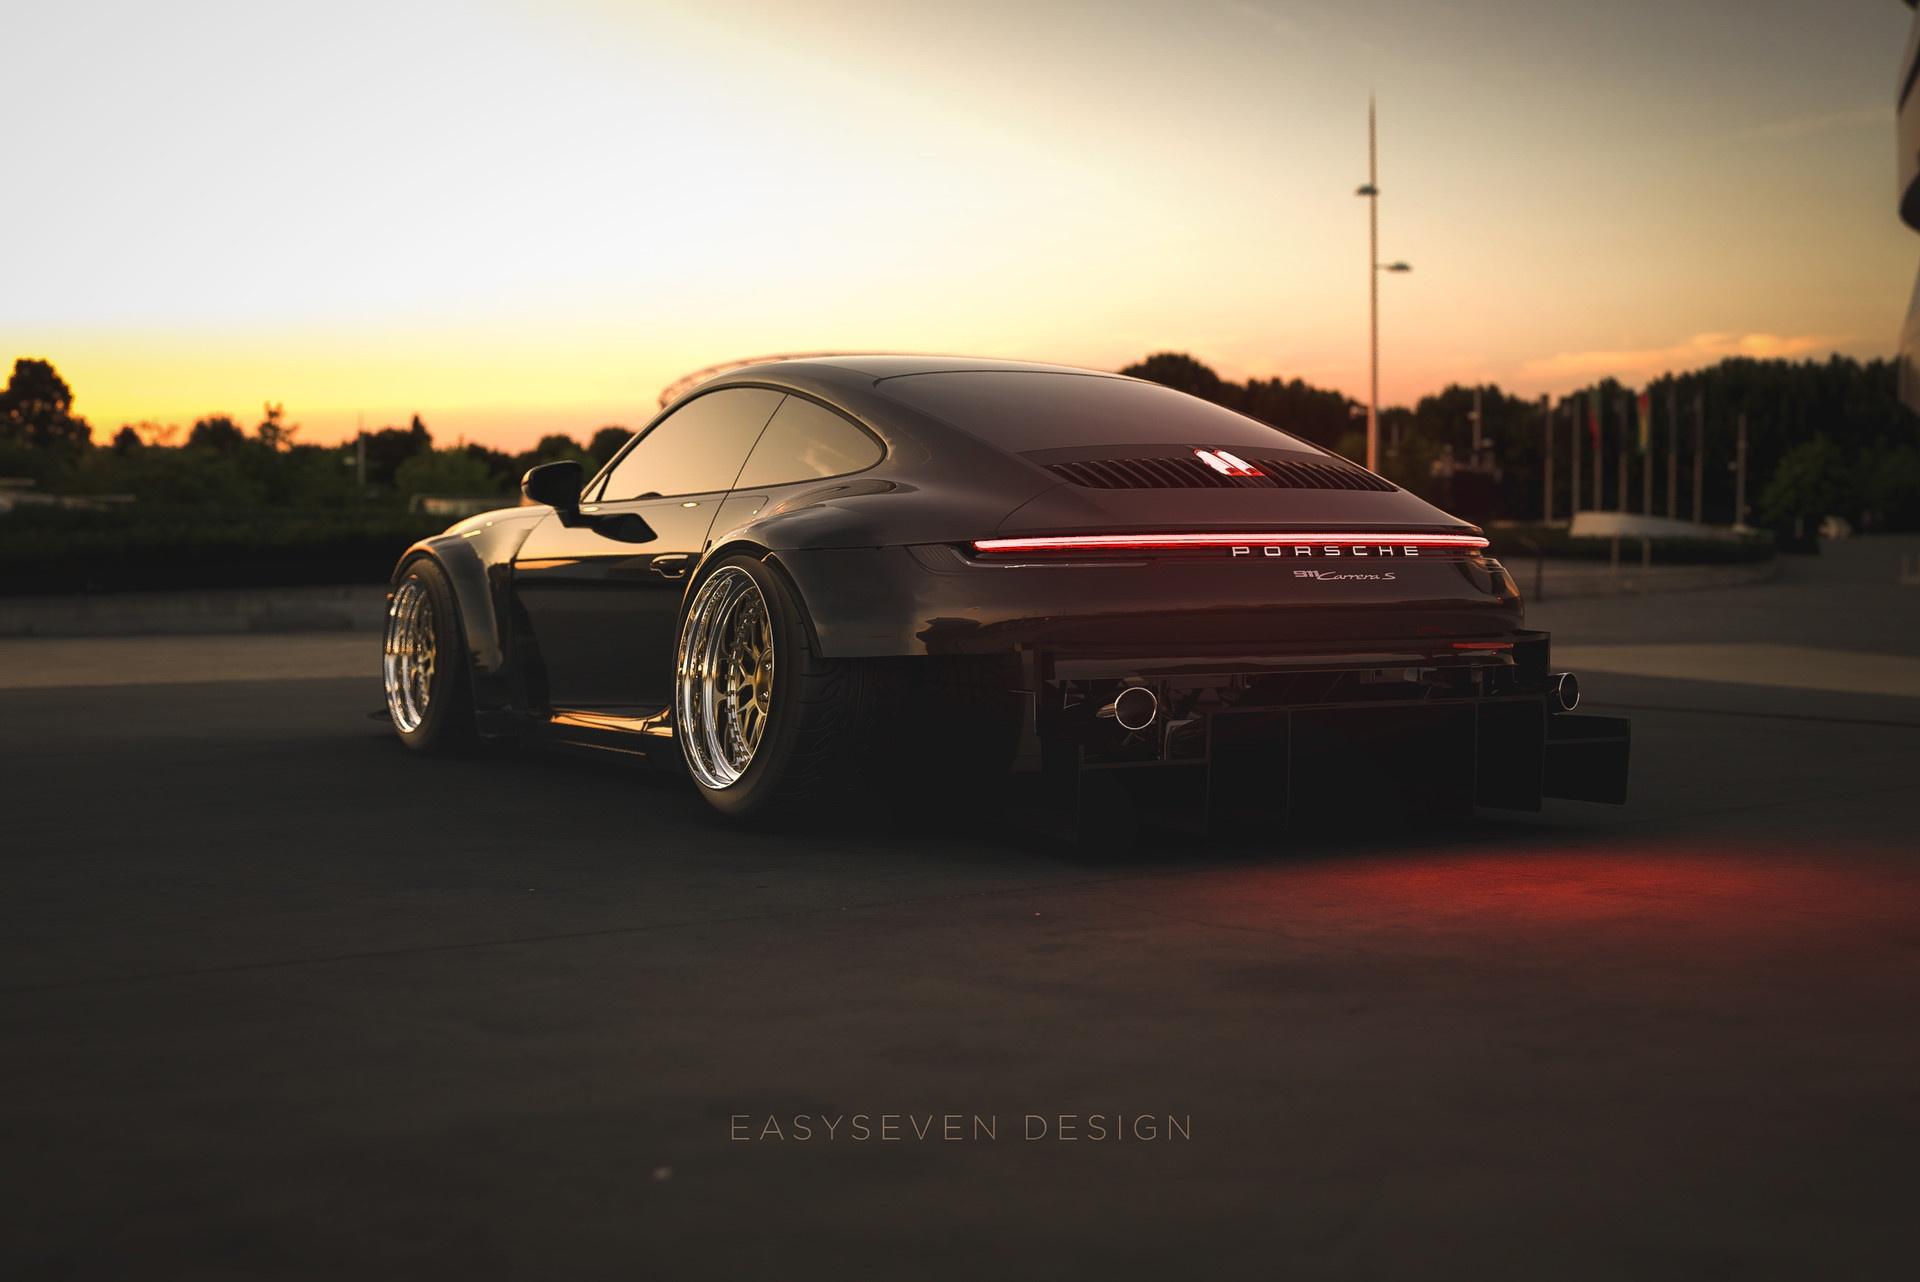 Wallpaper Vehicle Car Black Cars Porsche 911 1920x1282 Wallpapermaniac 1595011 Hd Wallpapers Wallhere